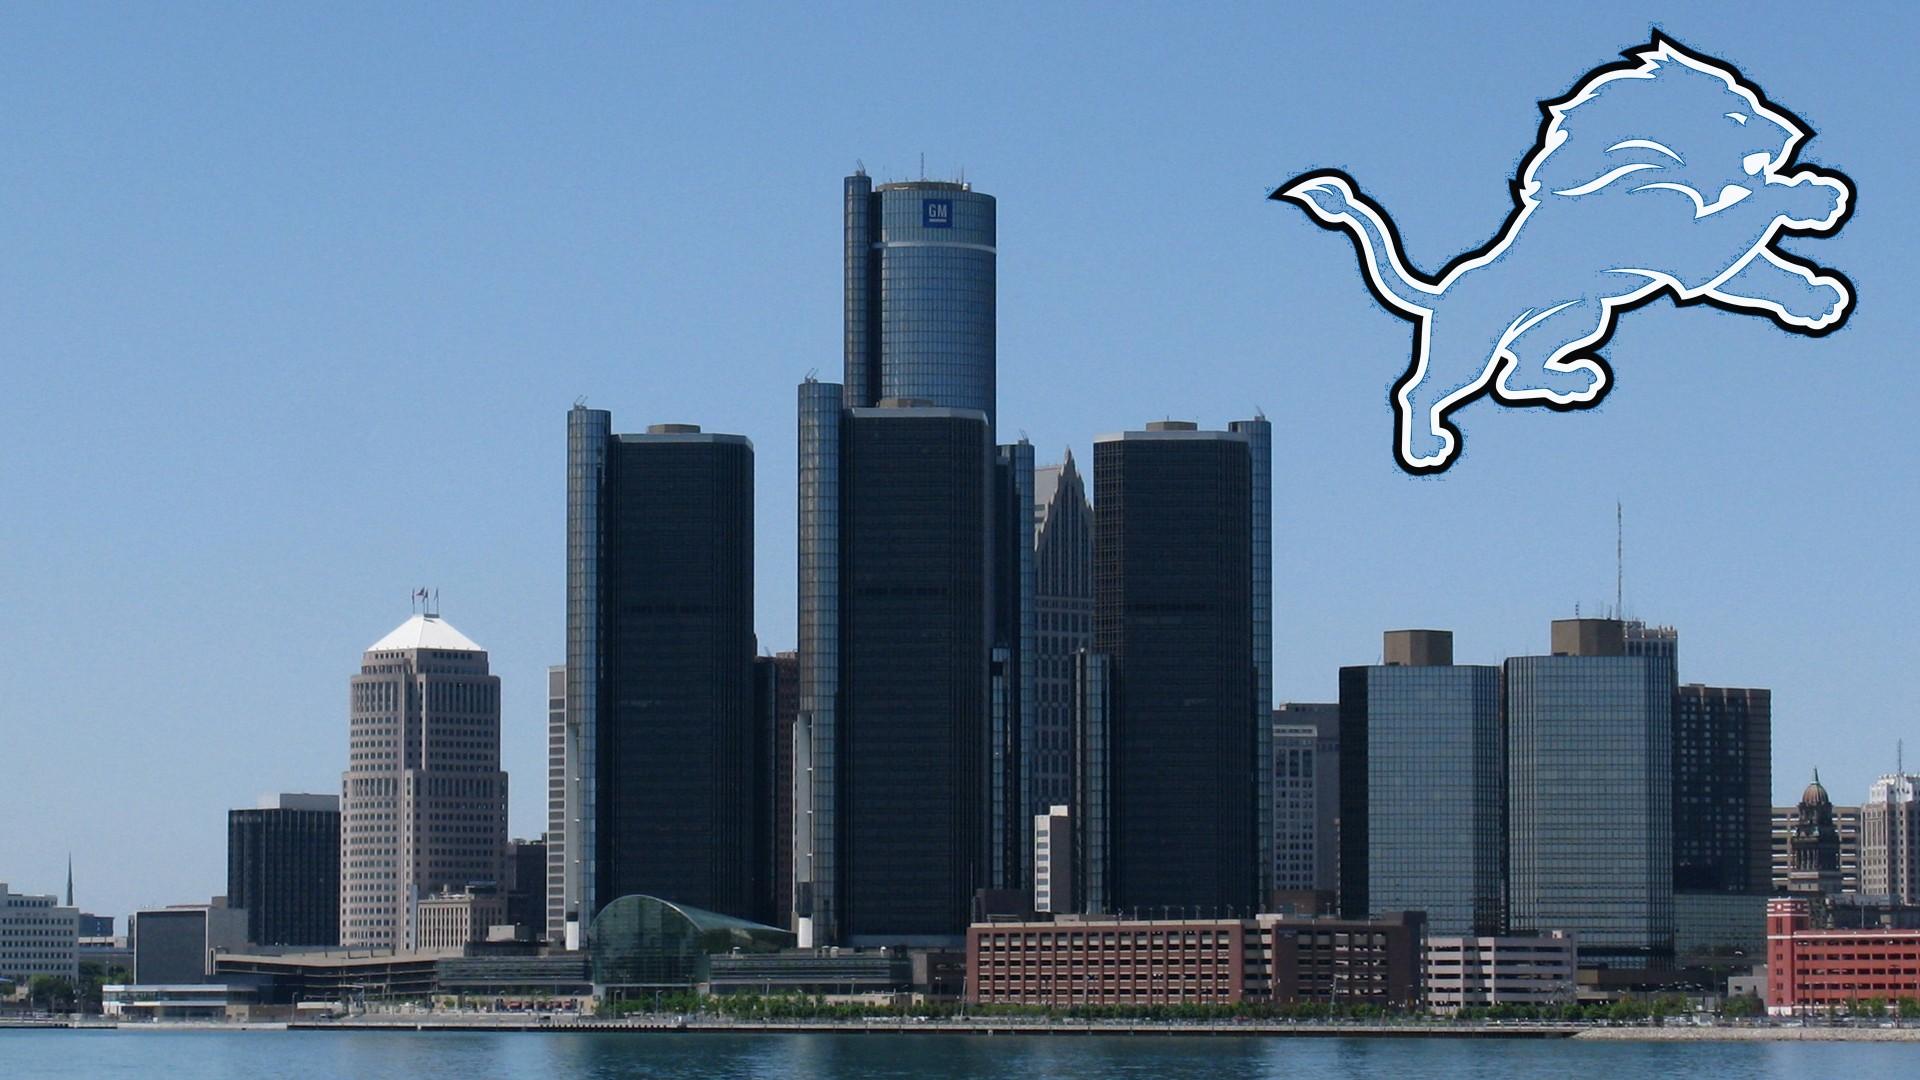 Download Detroit Skyline Hd 509627 Hd Wallpaper Backgrounds Download